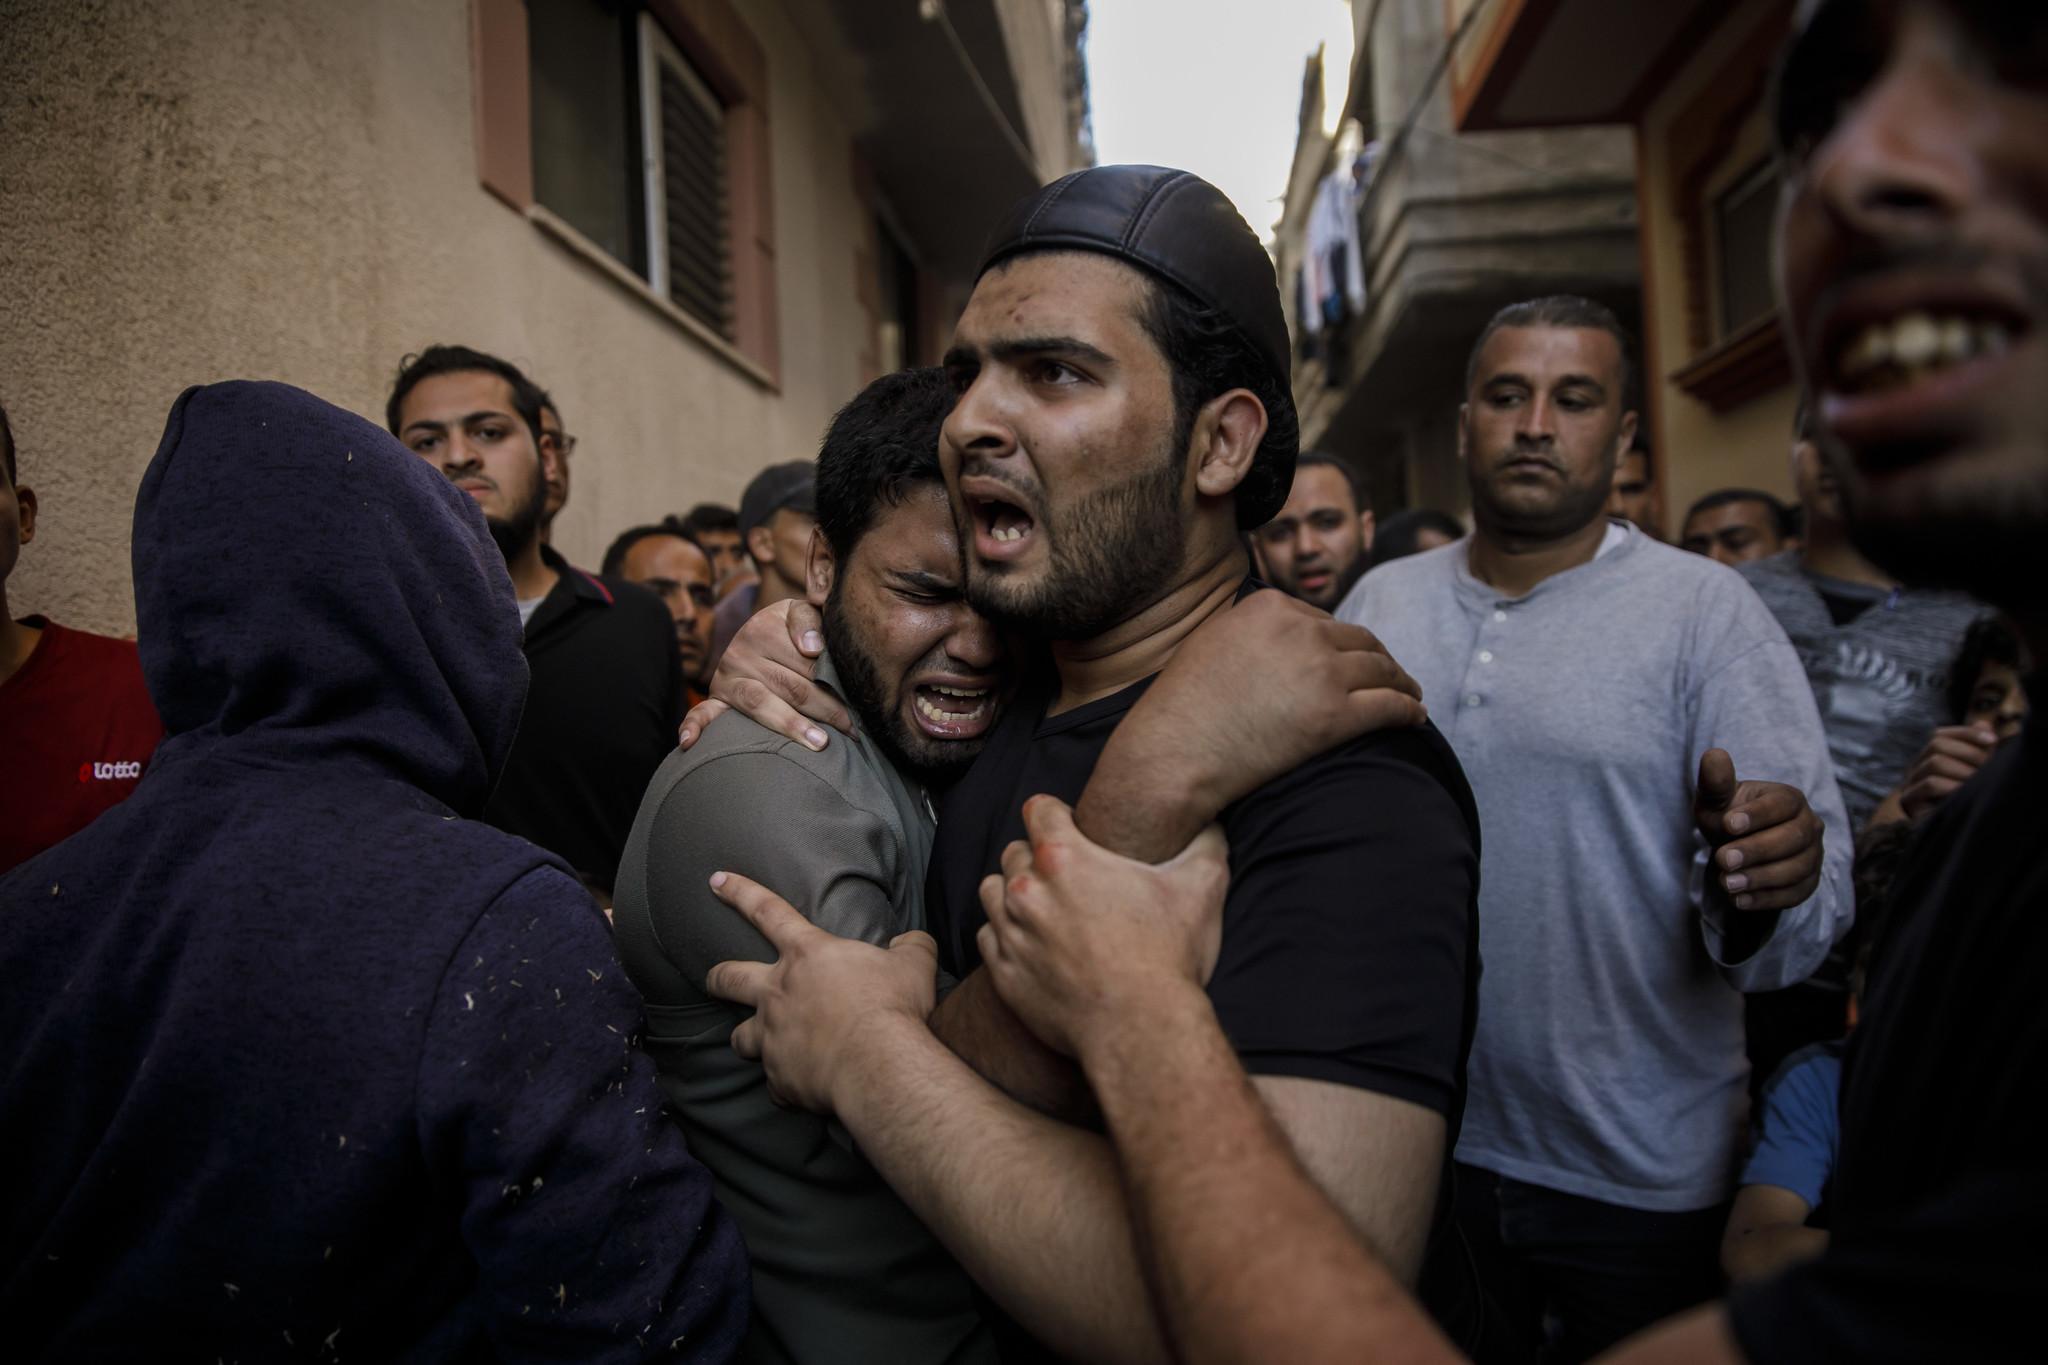 GAZA CITY, GAZA — MONDAY, MAY 14, 2018: Relatives of Taher Ahmed Madi, 25, mourn his death after hi